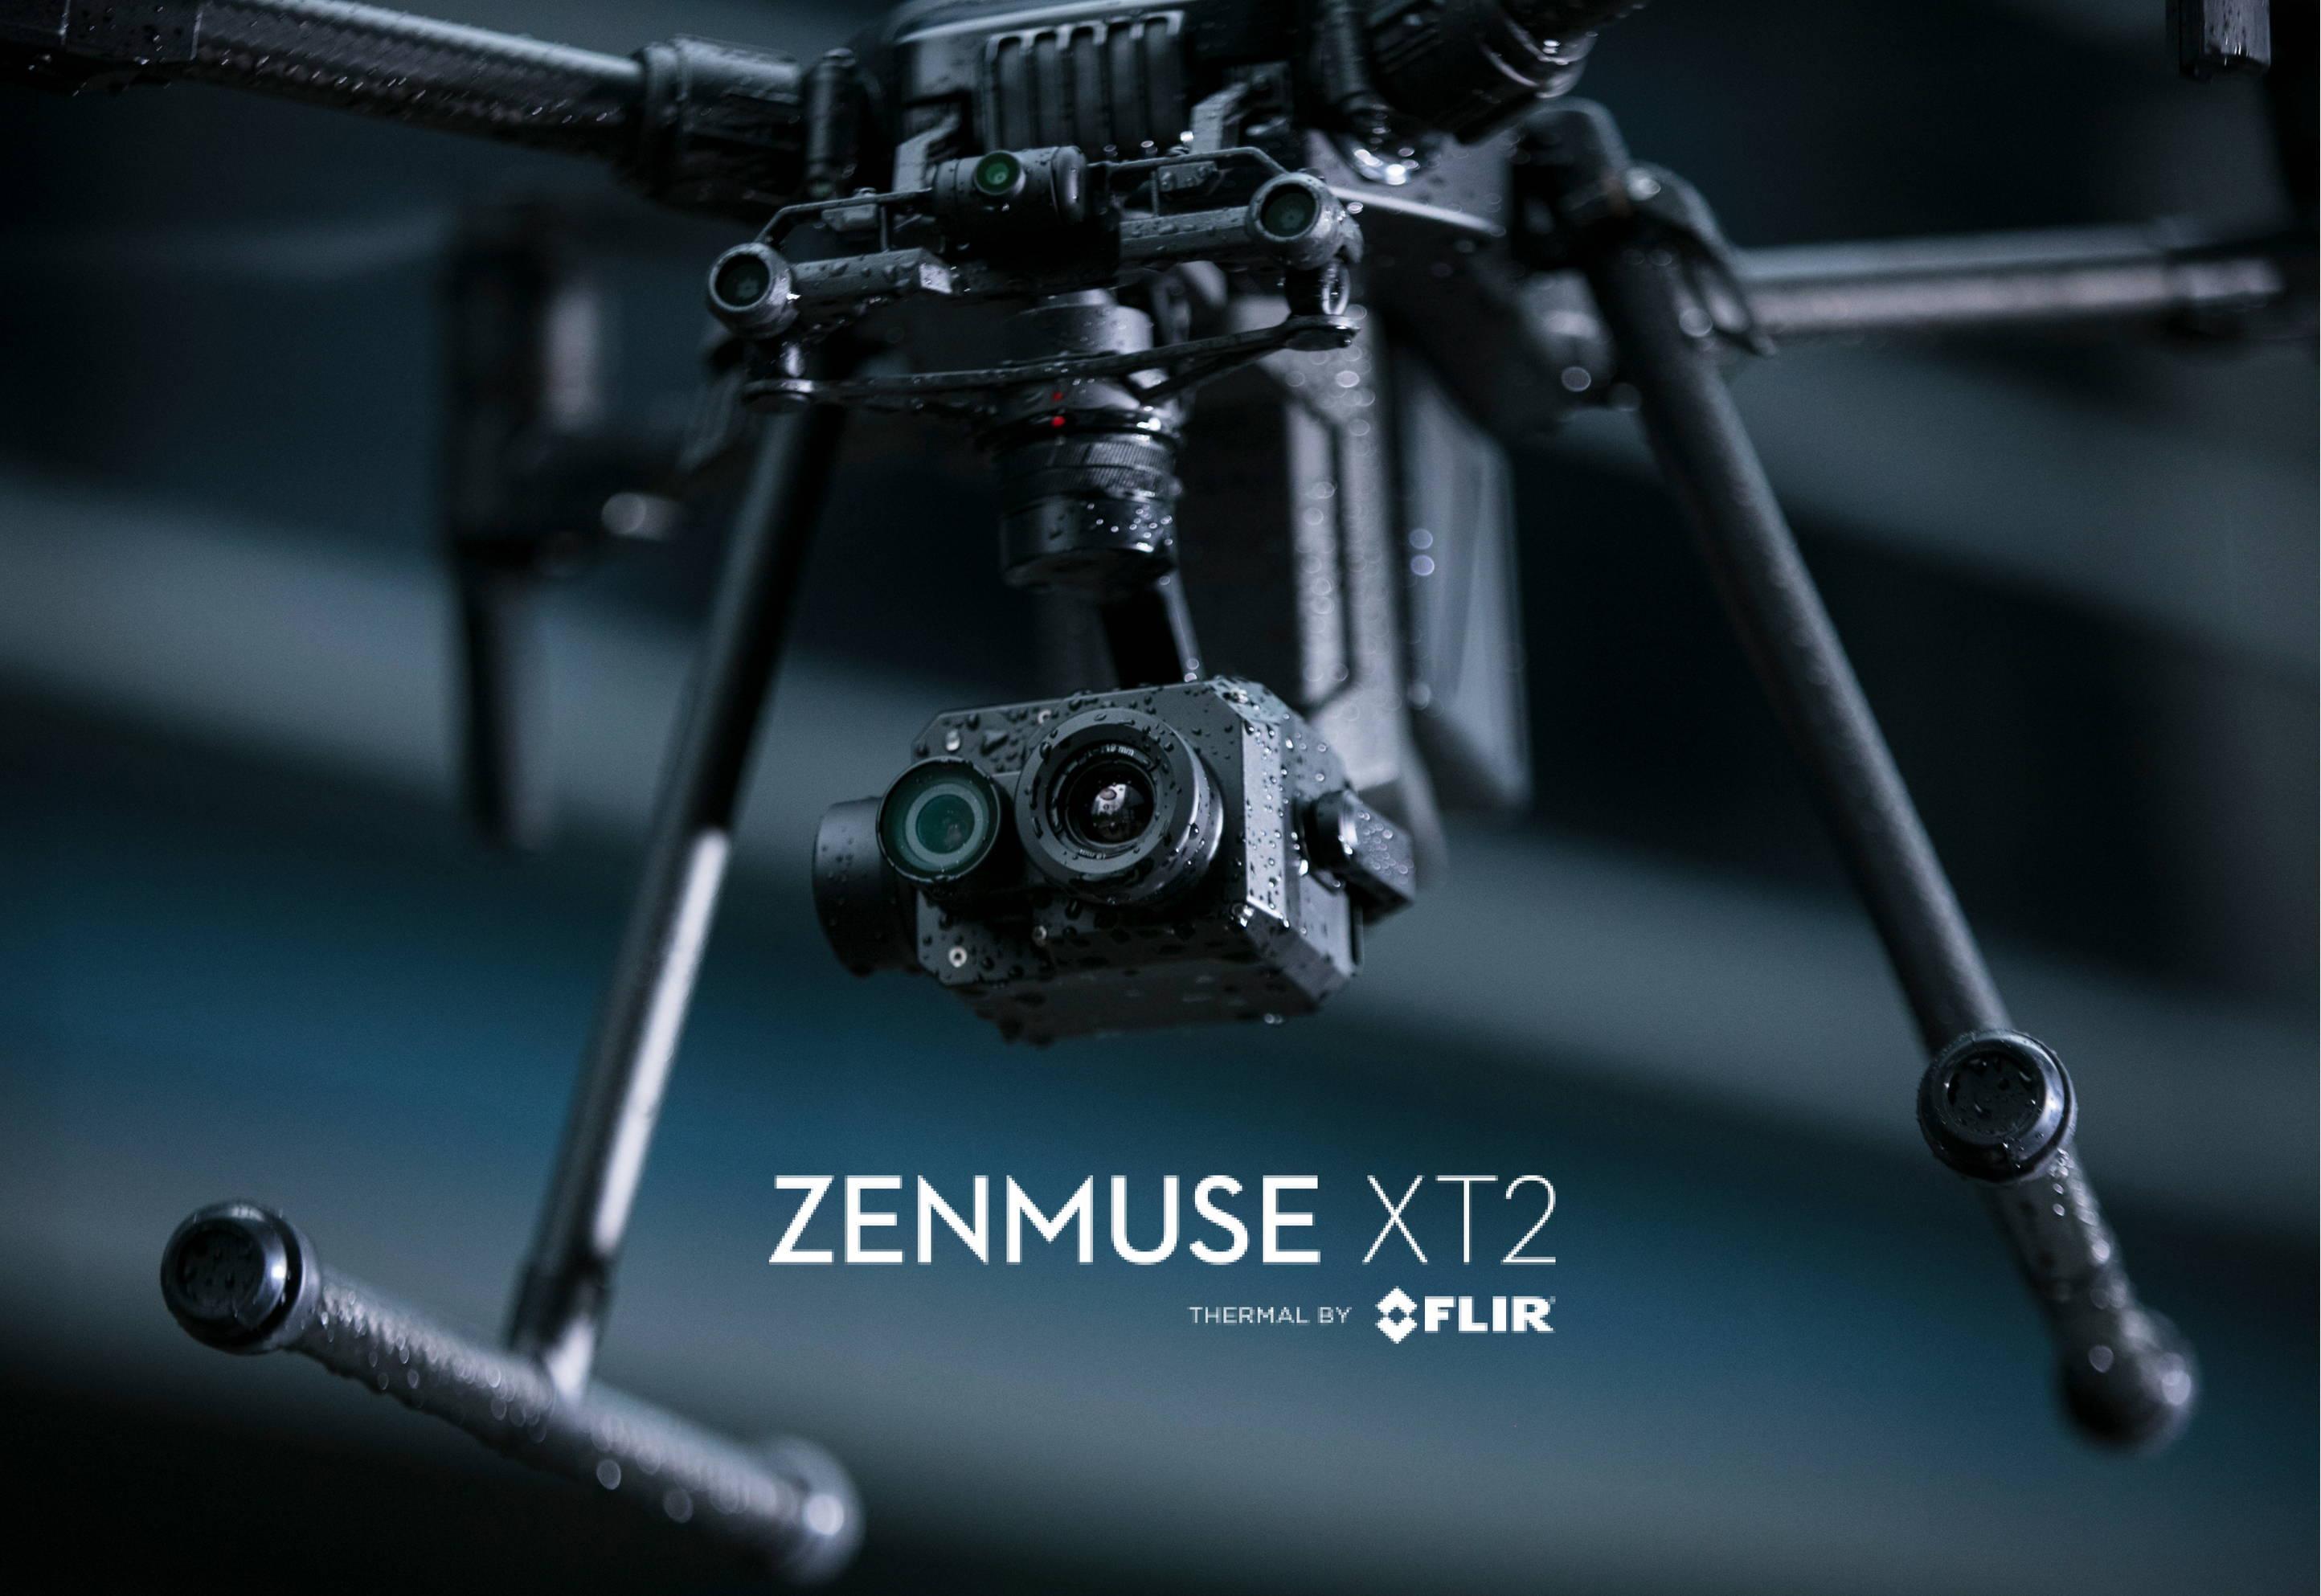 Zenmuse XT2